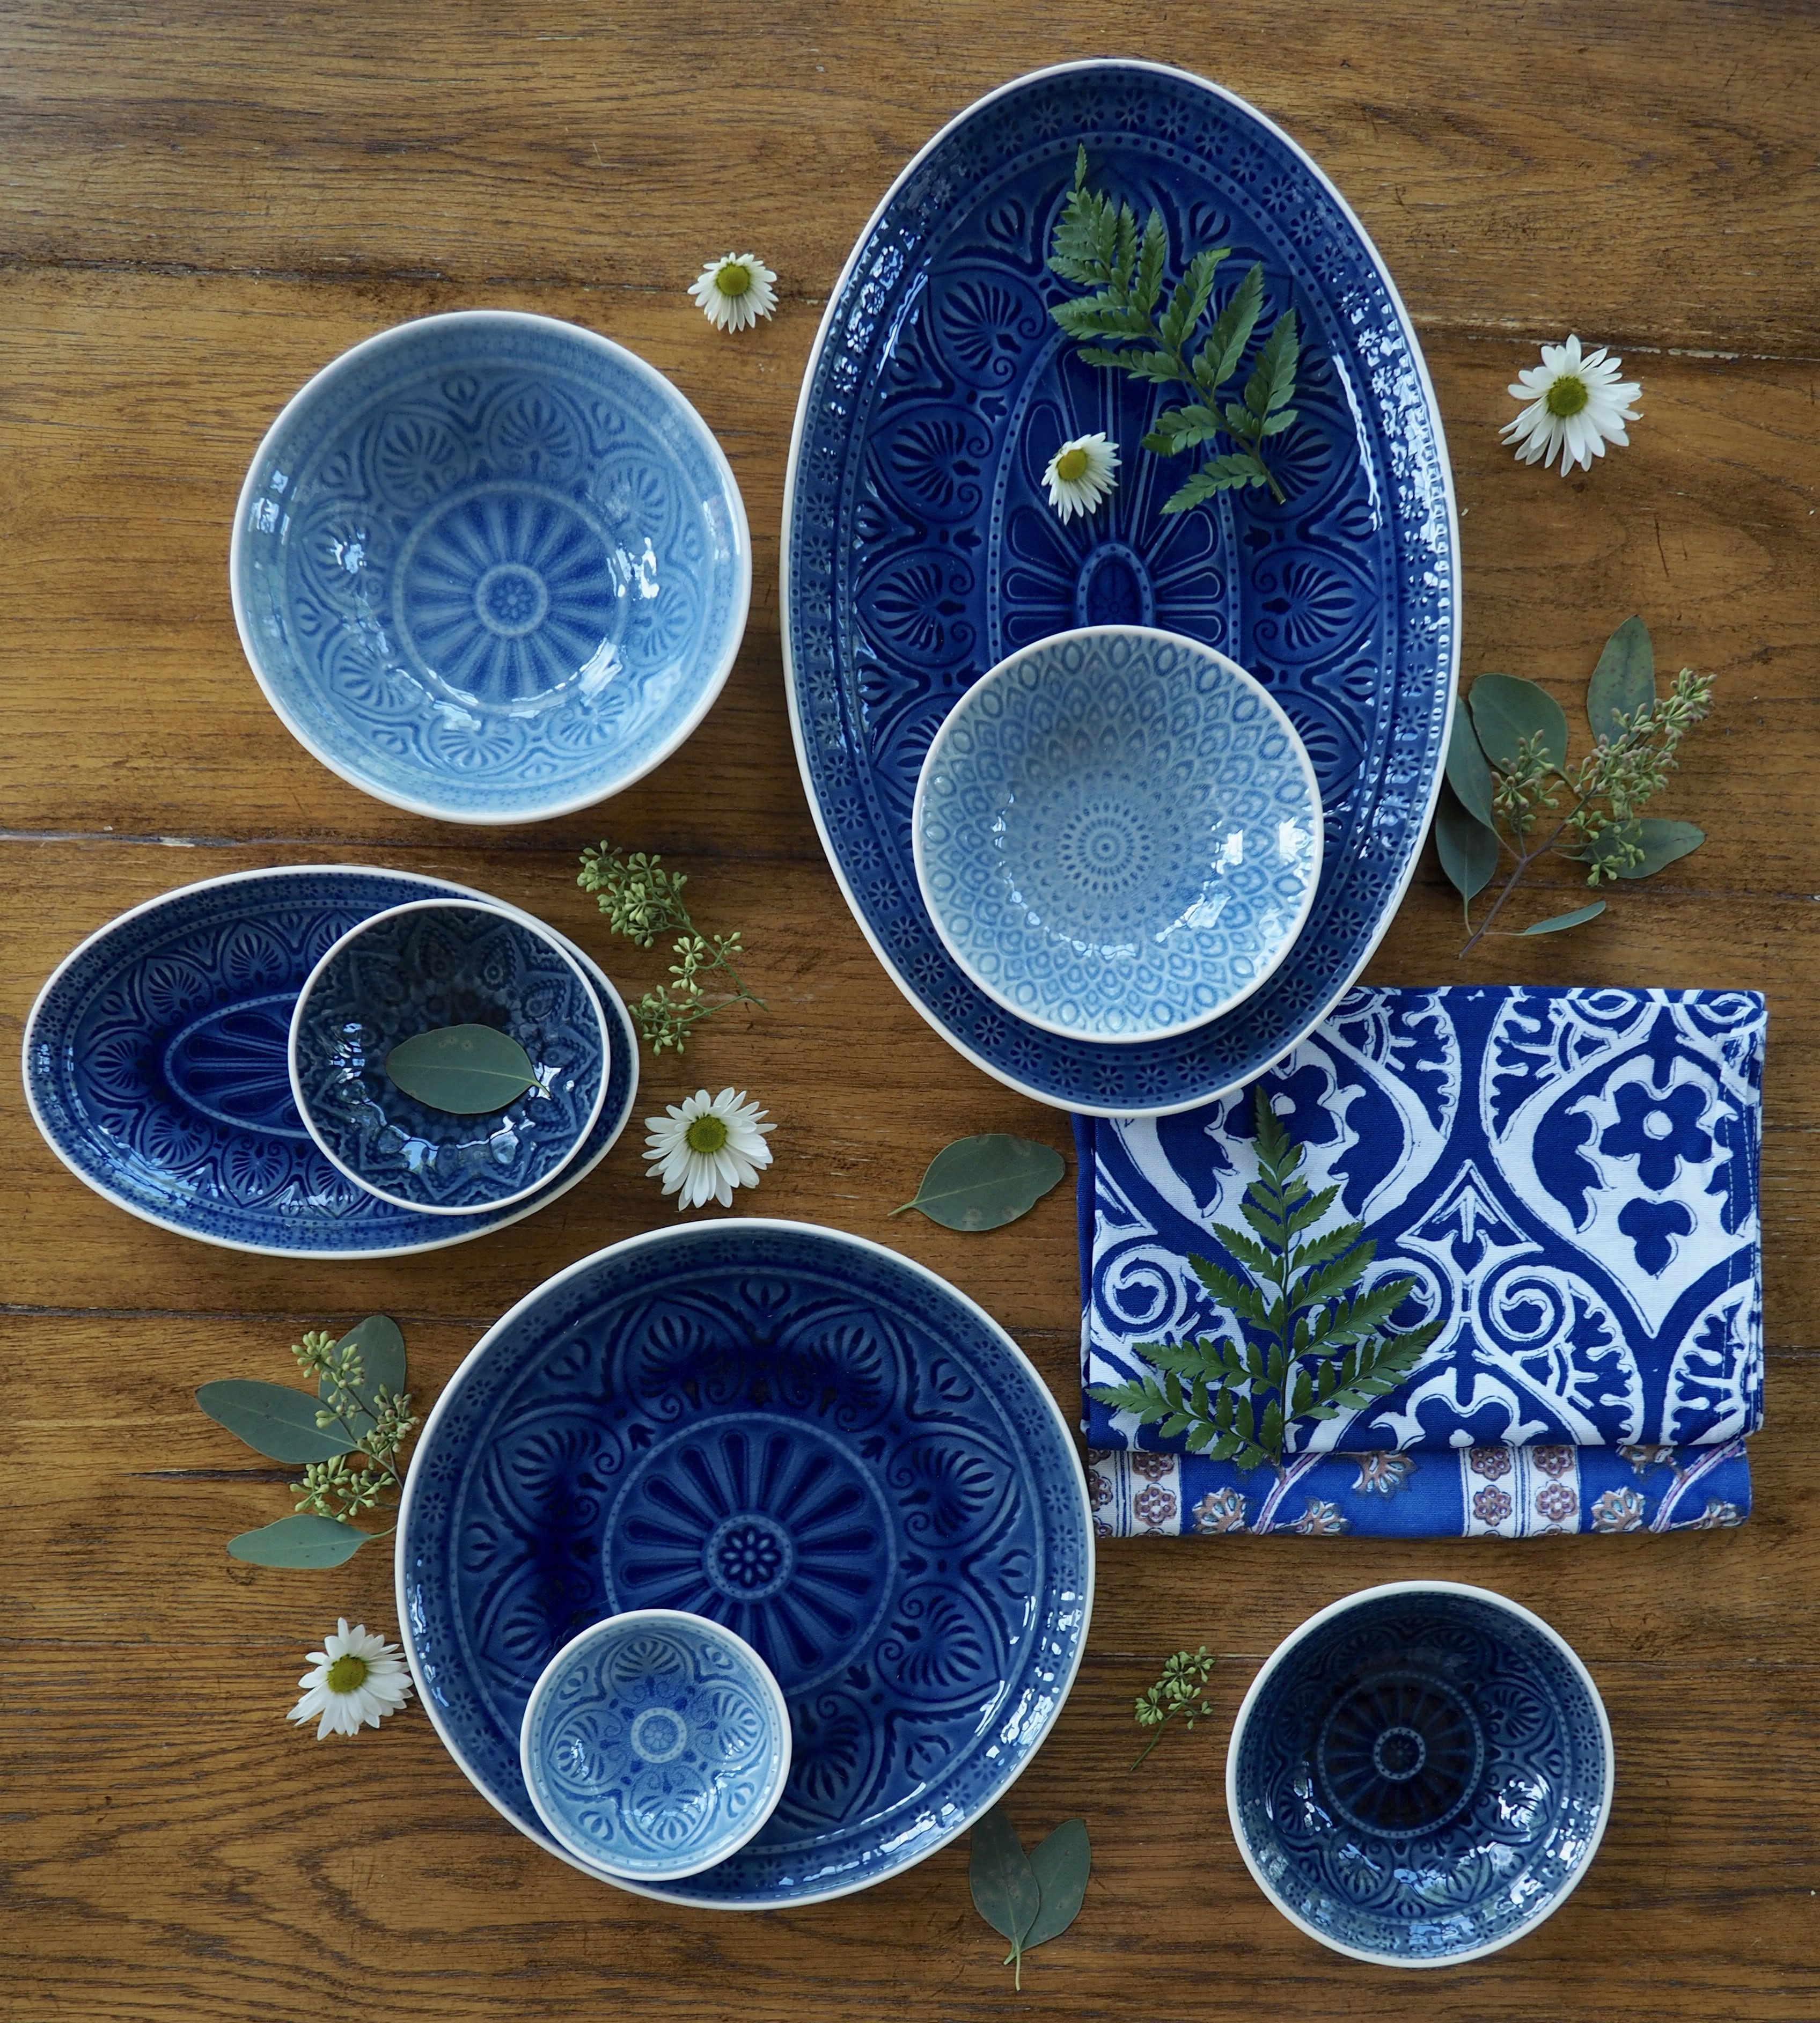 Sky blue glazed stoneware bowls designed by